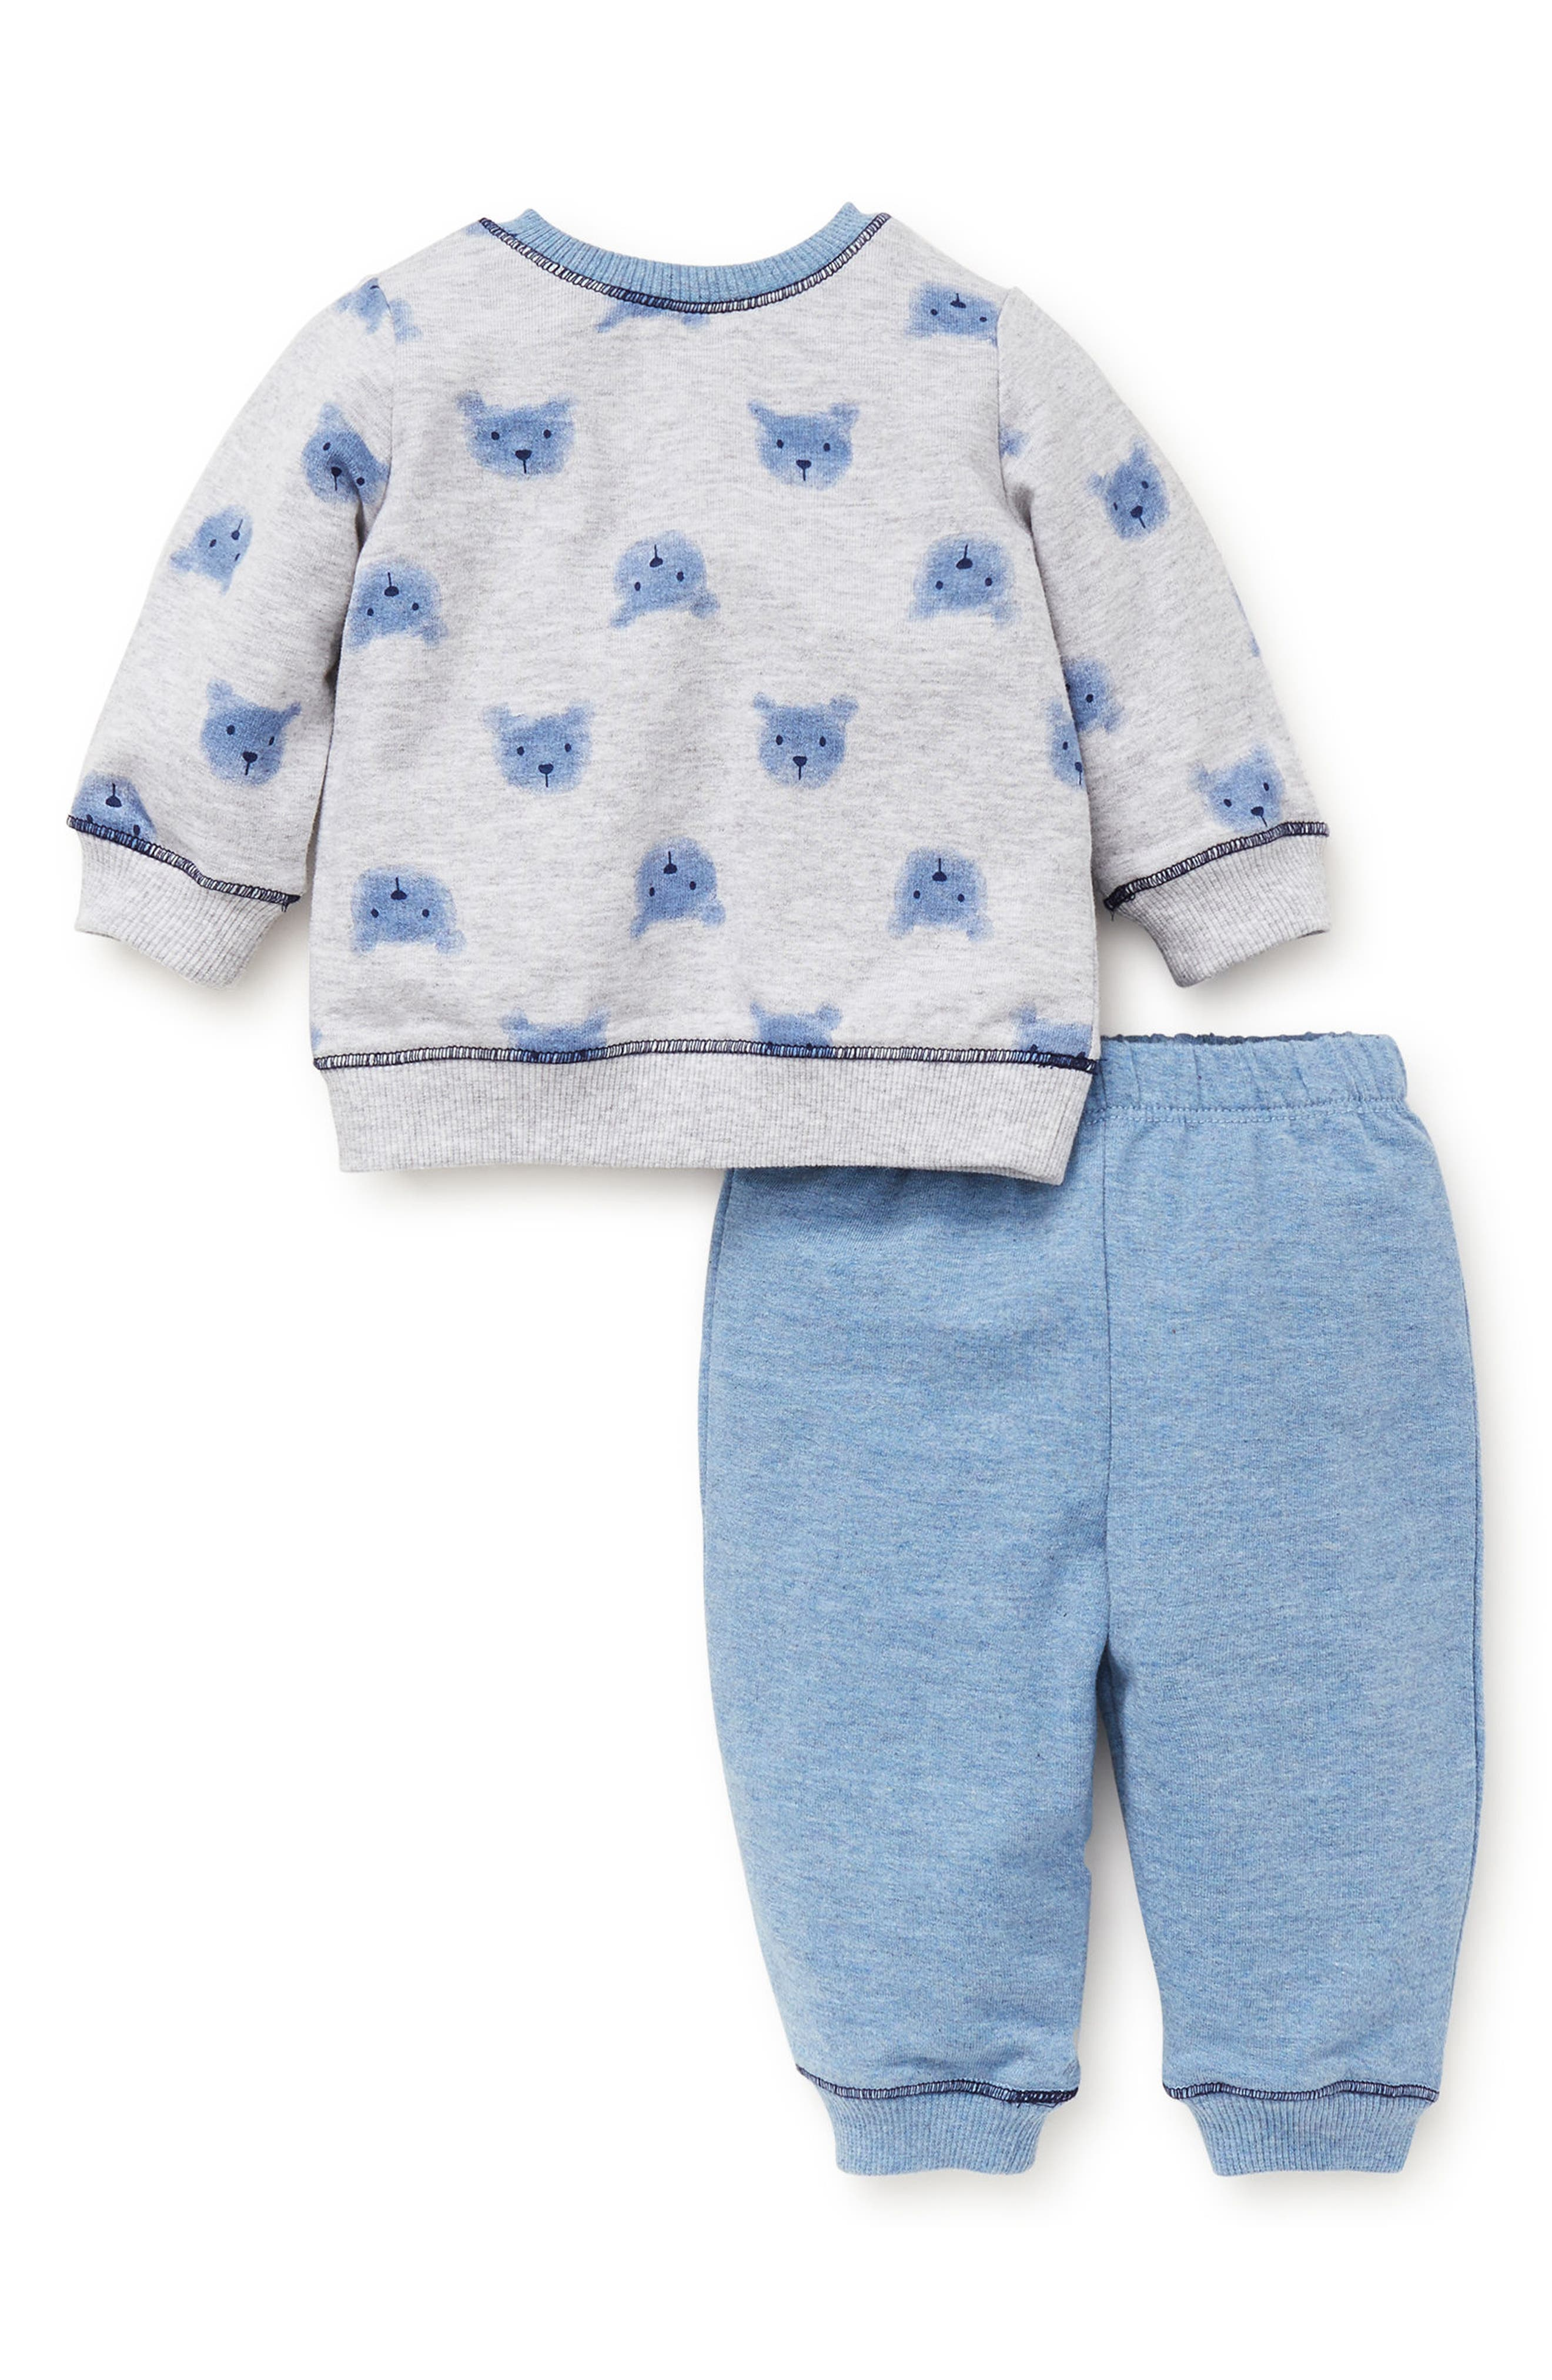 Bears Sweatshirt & Sweatpants Set,                             Alternate thumbnail 2, color,                             BLUE